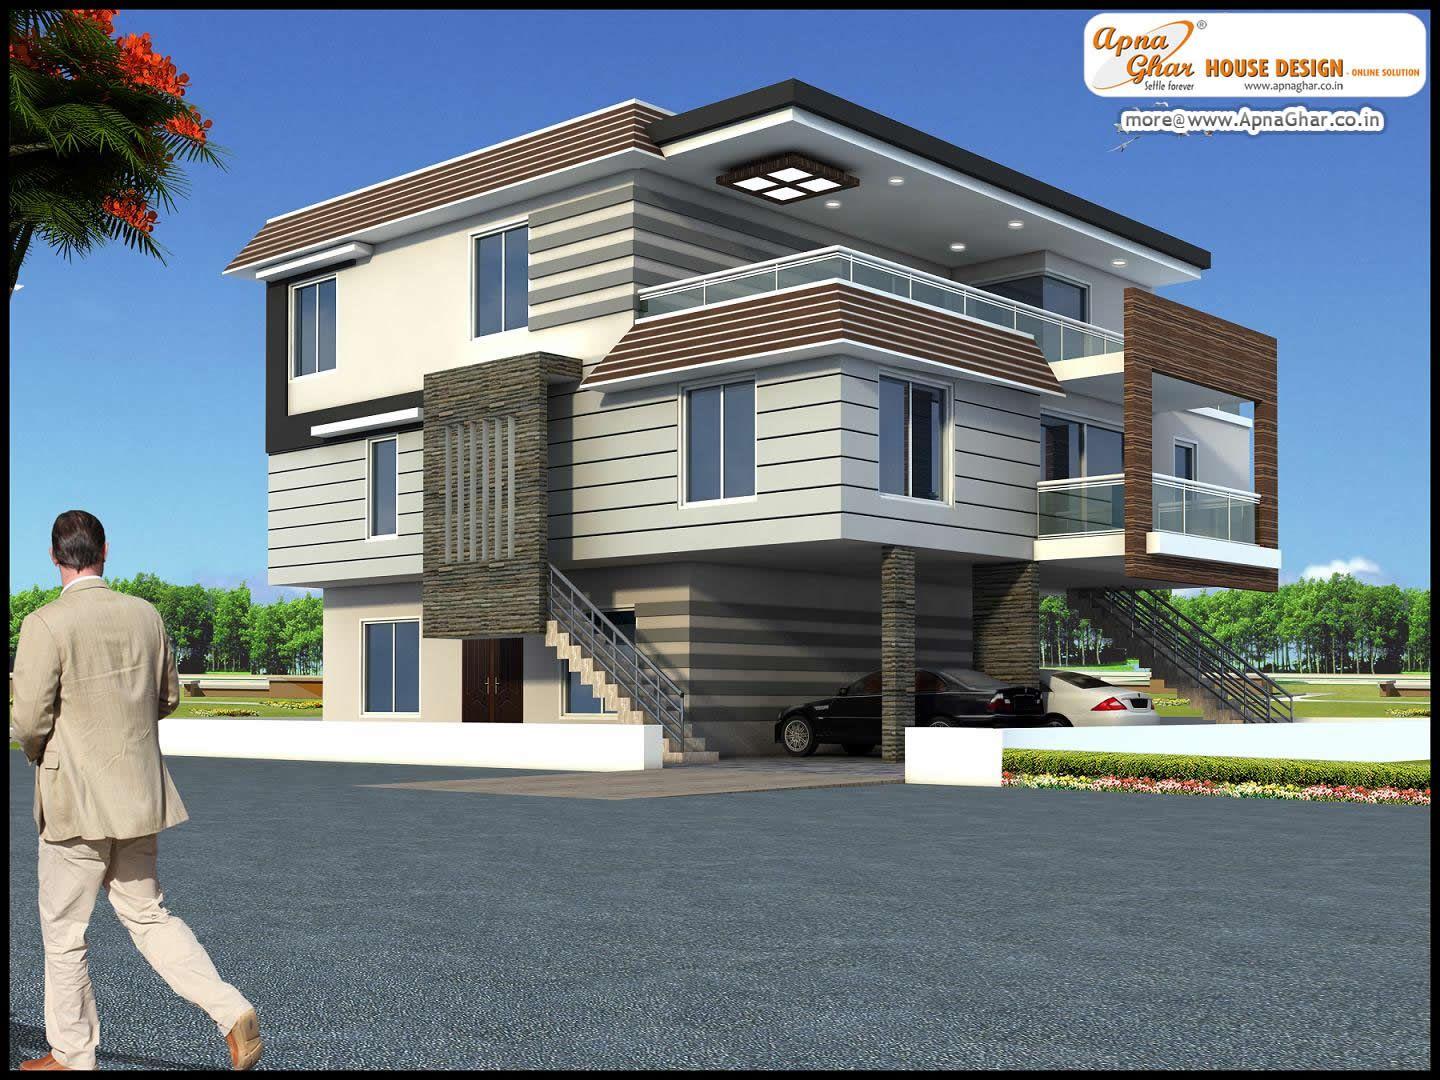 Triplex House Plans 5 Bedroom Modern Triplex 3 Floor House Designarea 140 Sq Mts